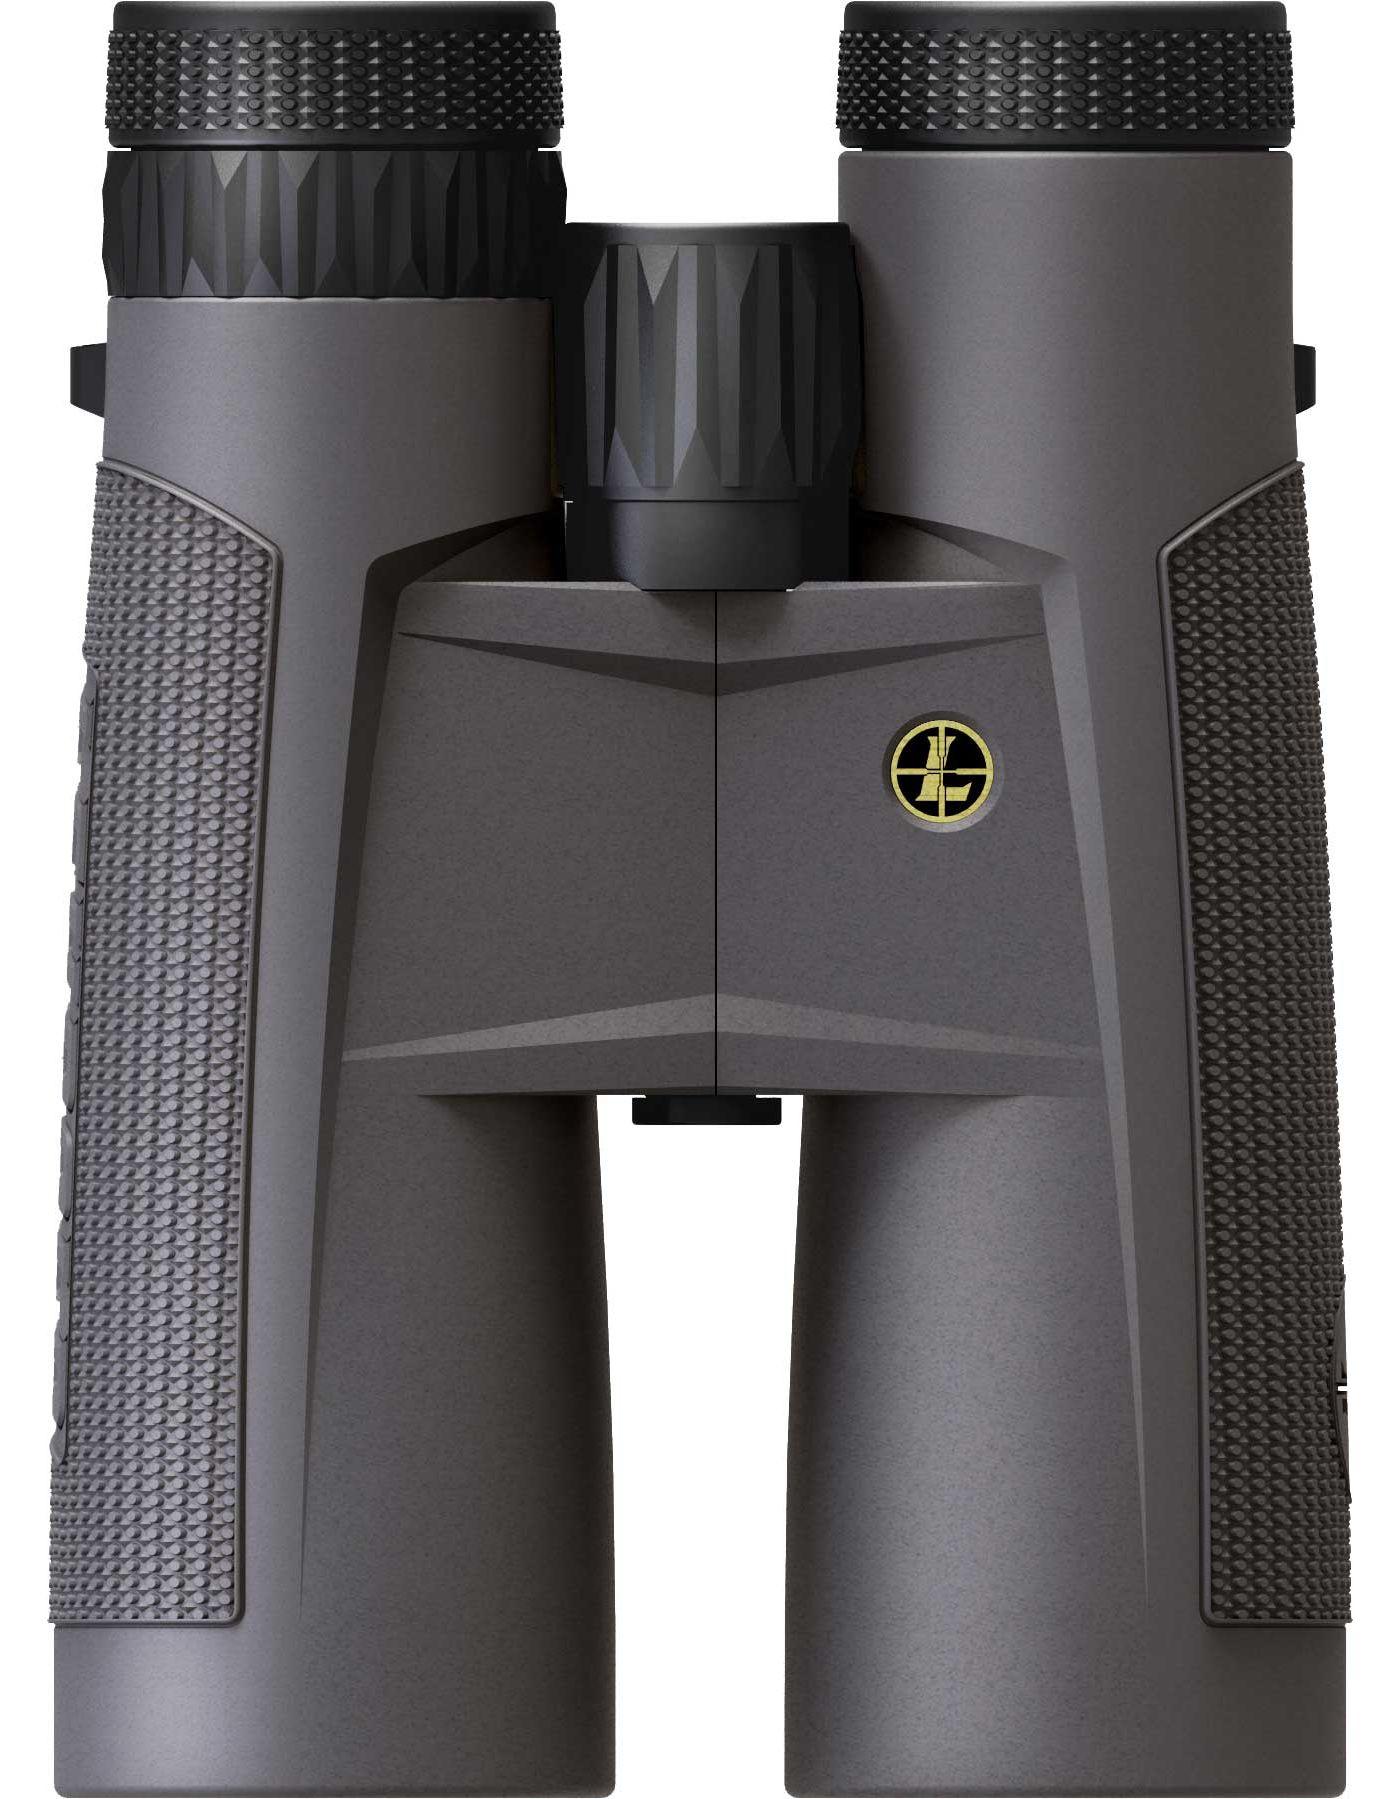 Leupold BX-2 Tioga HD 12x50mm Binoculars